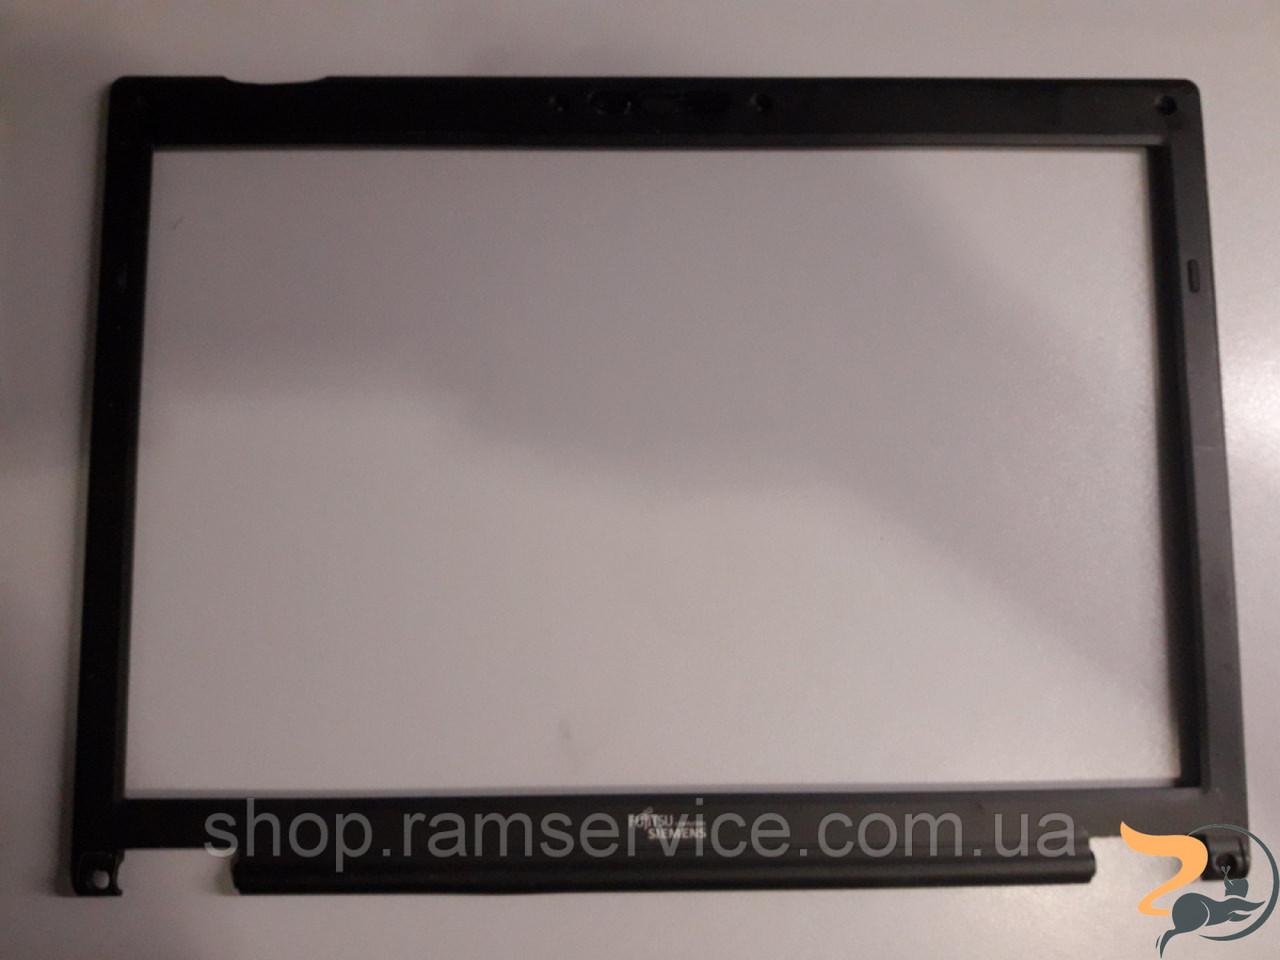 Рамка матриці корпуса для ноутбука Fujitsu LifeBook S7220, б/в